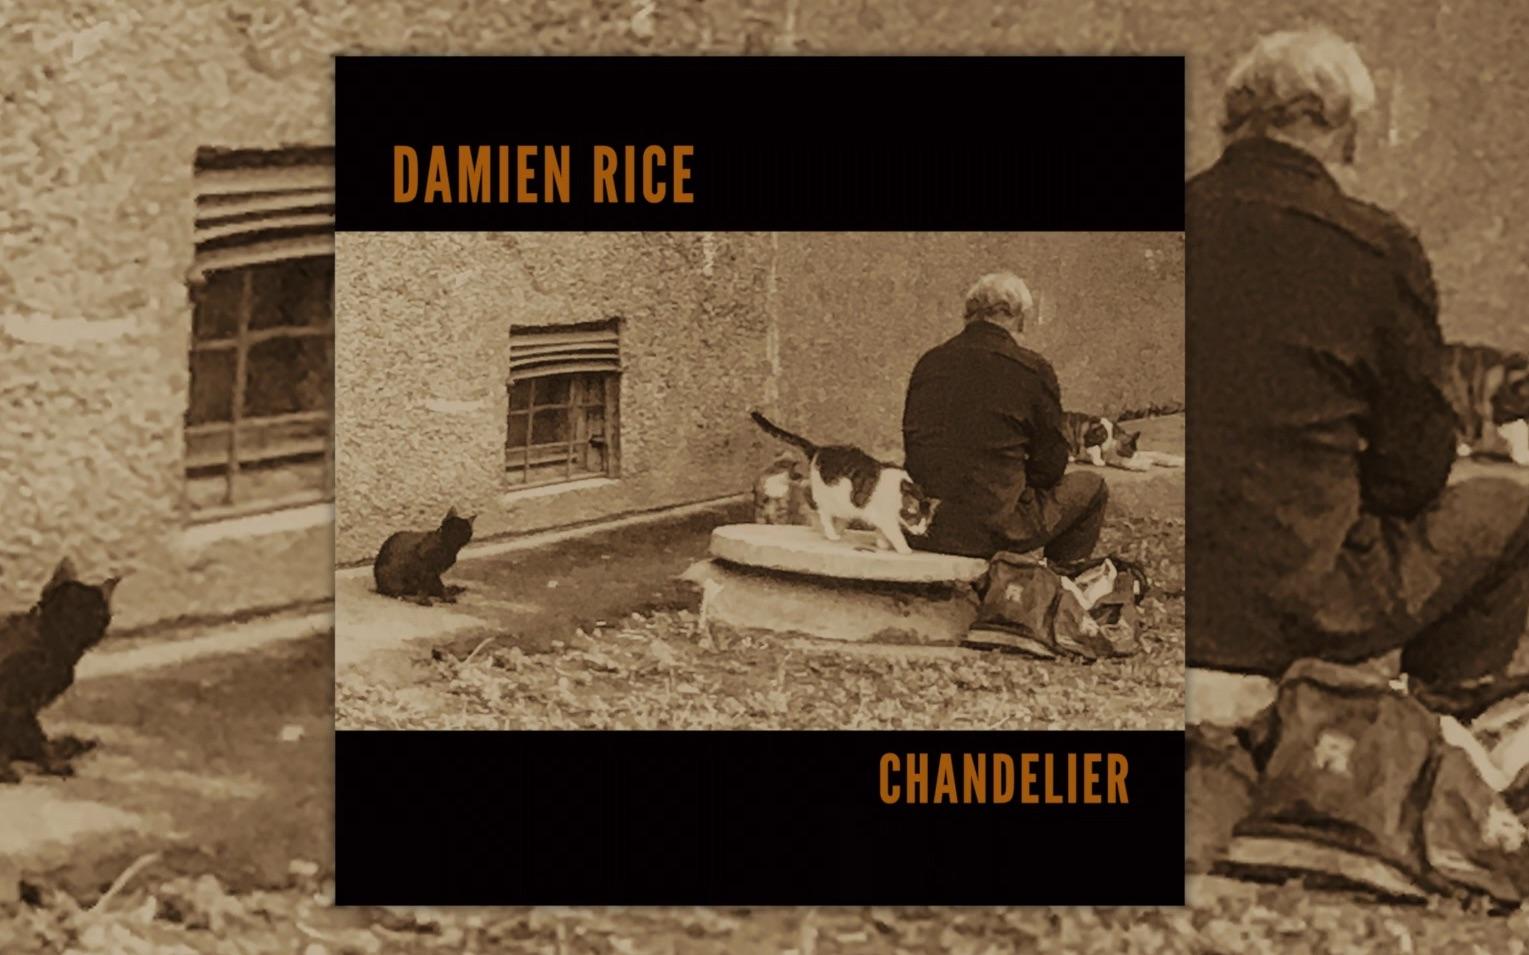 【全曲试听】Damien Rice深情演绎SIA热单Chandelier